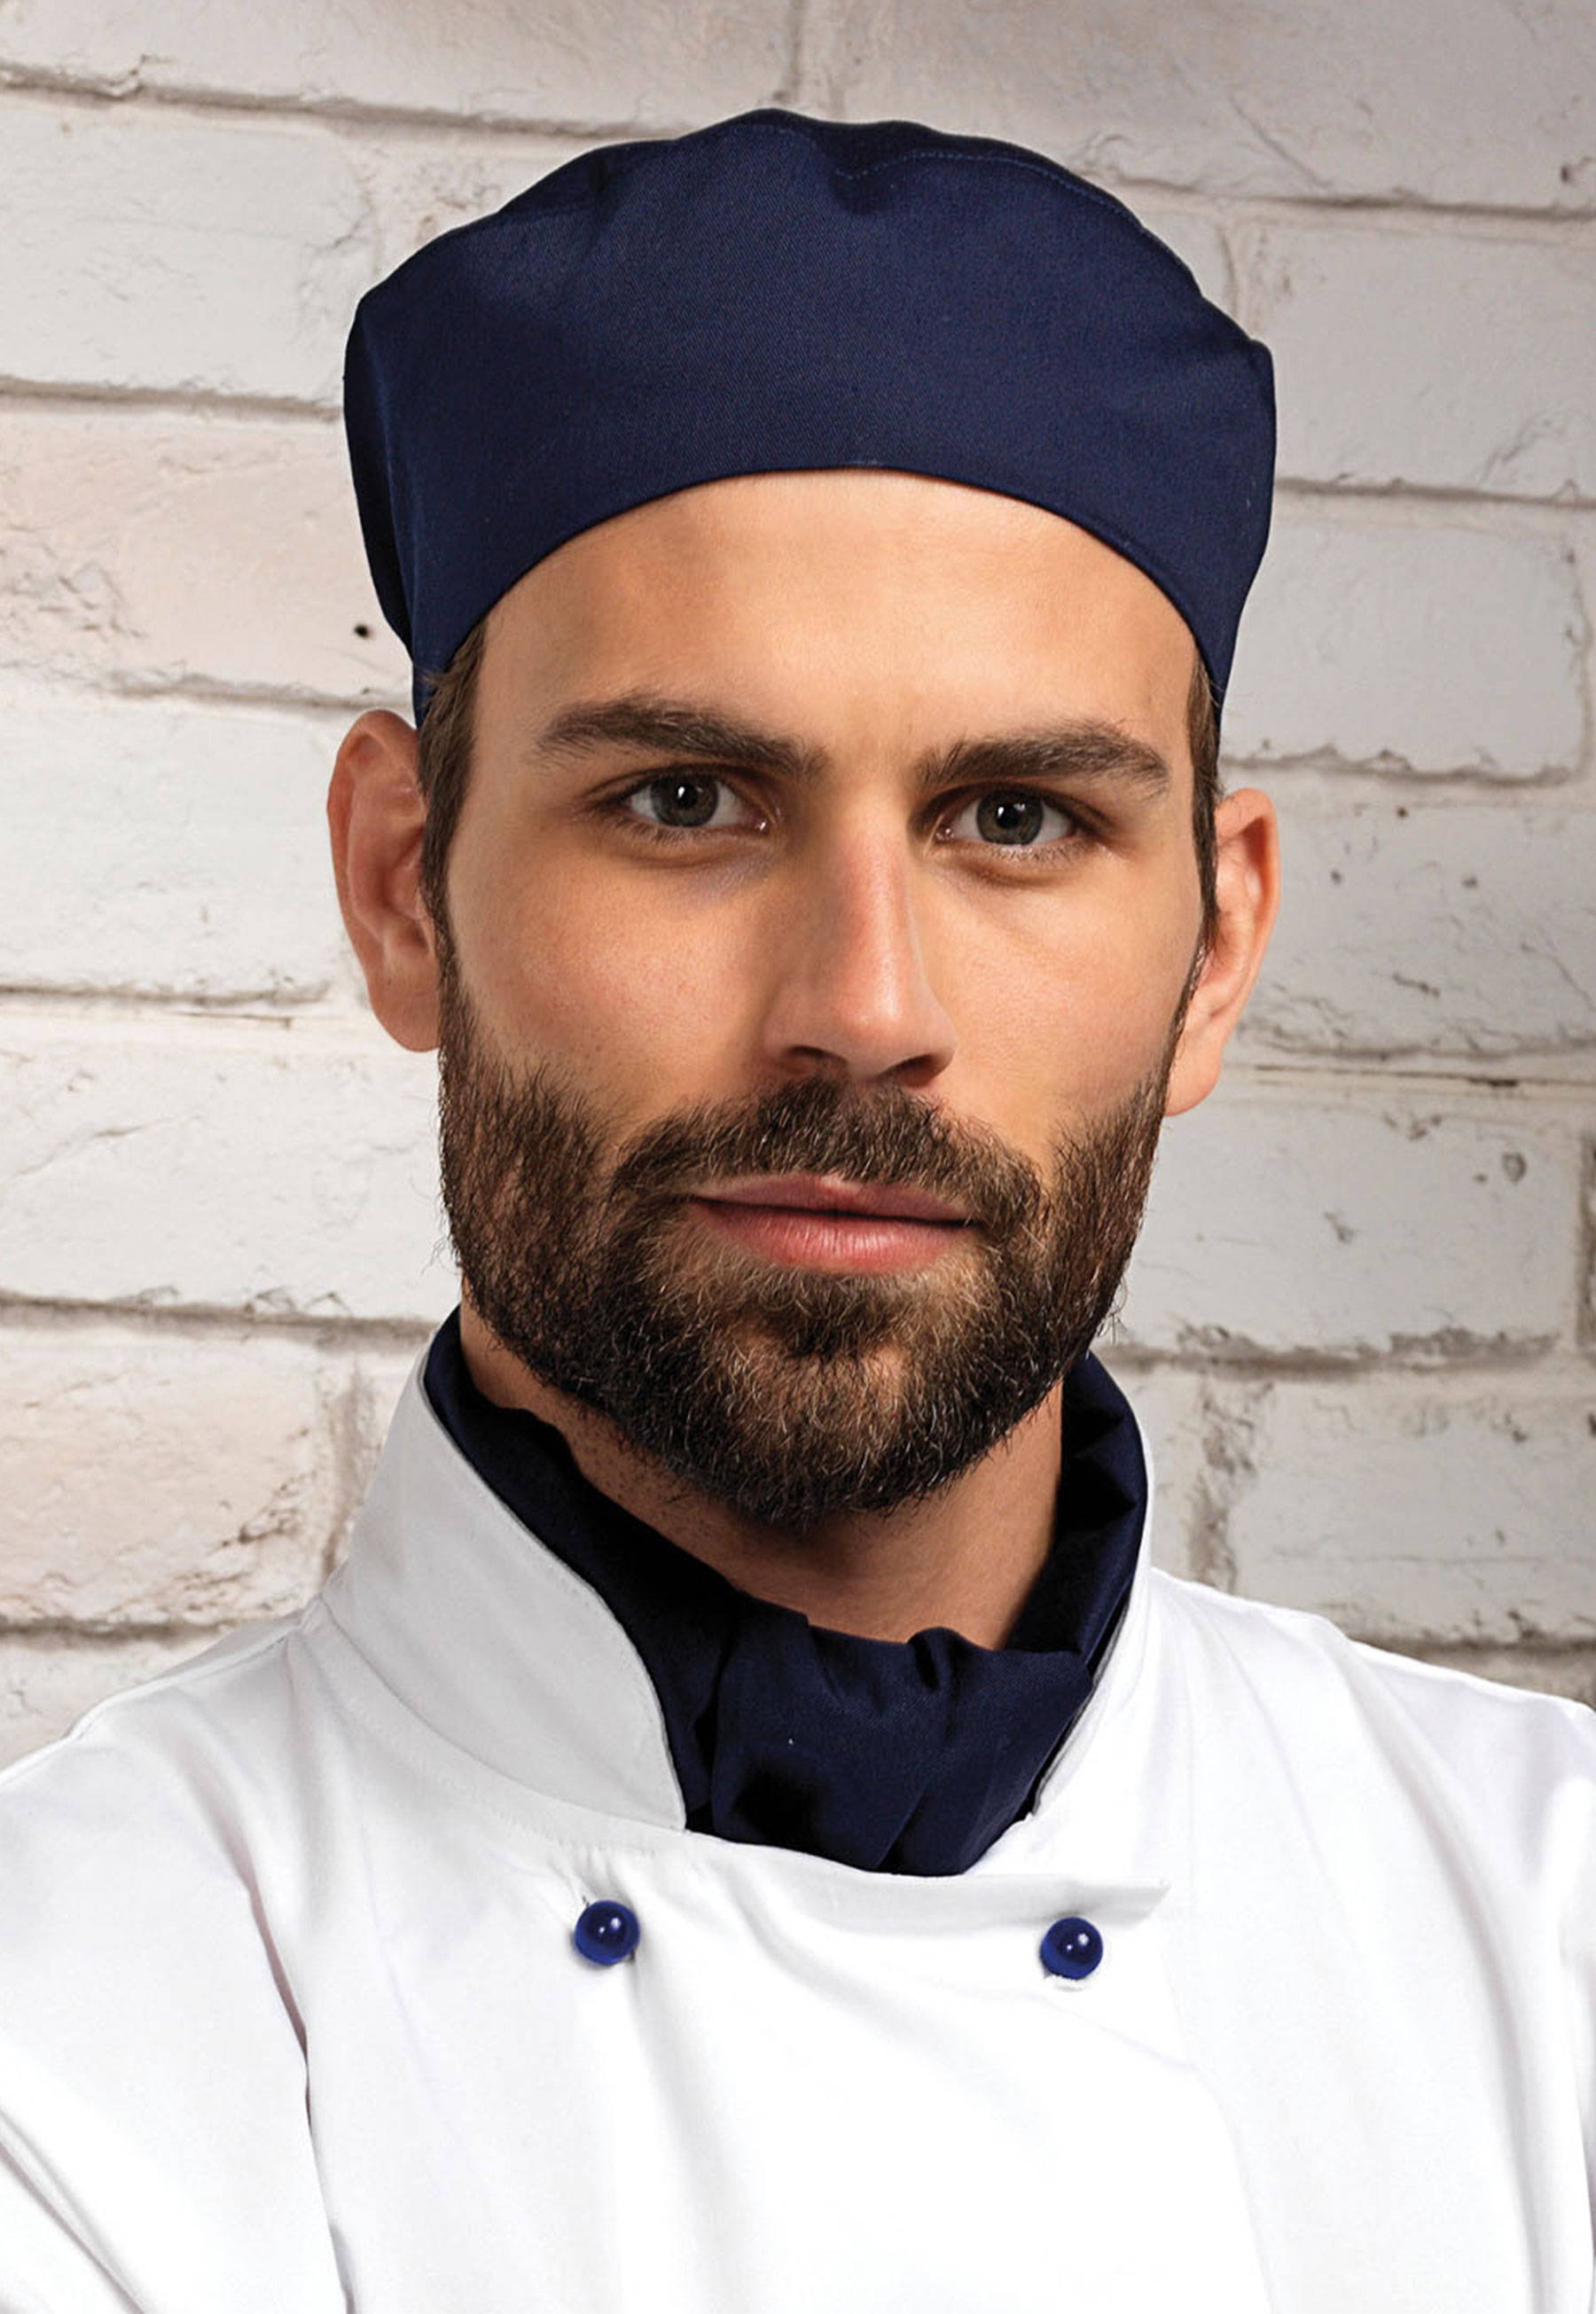 chefs hats